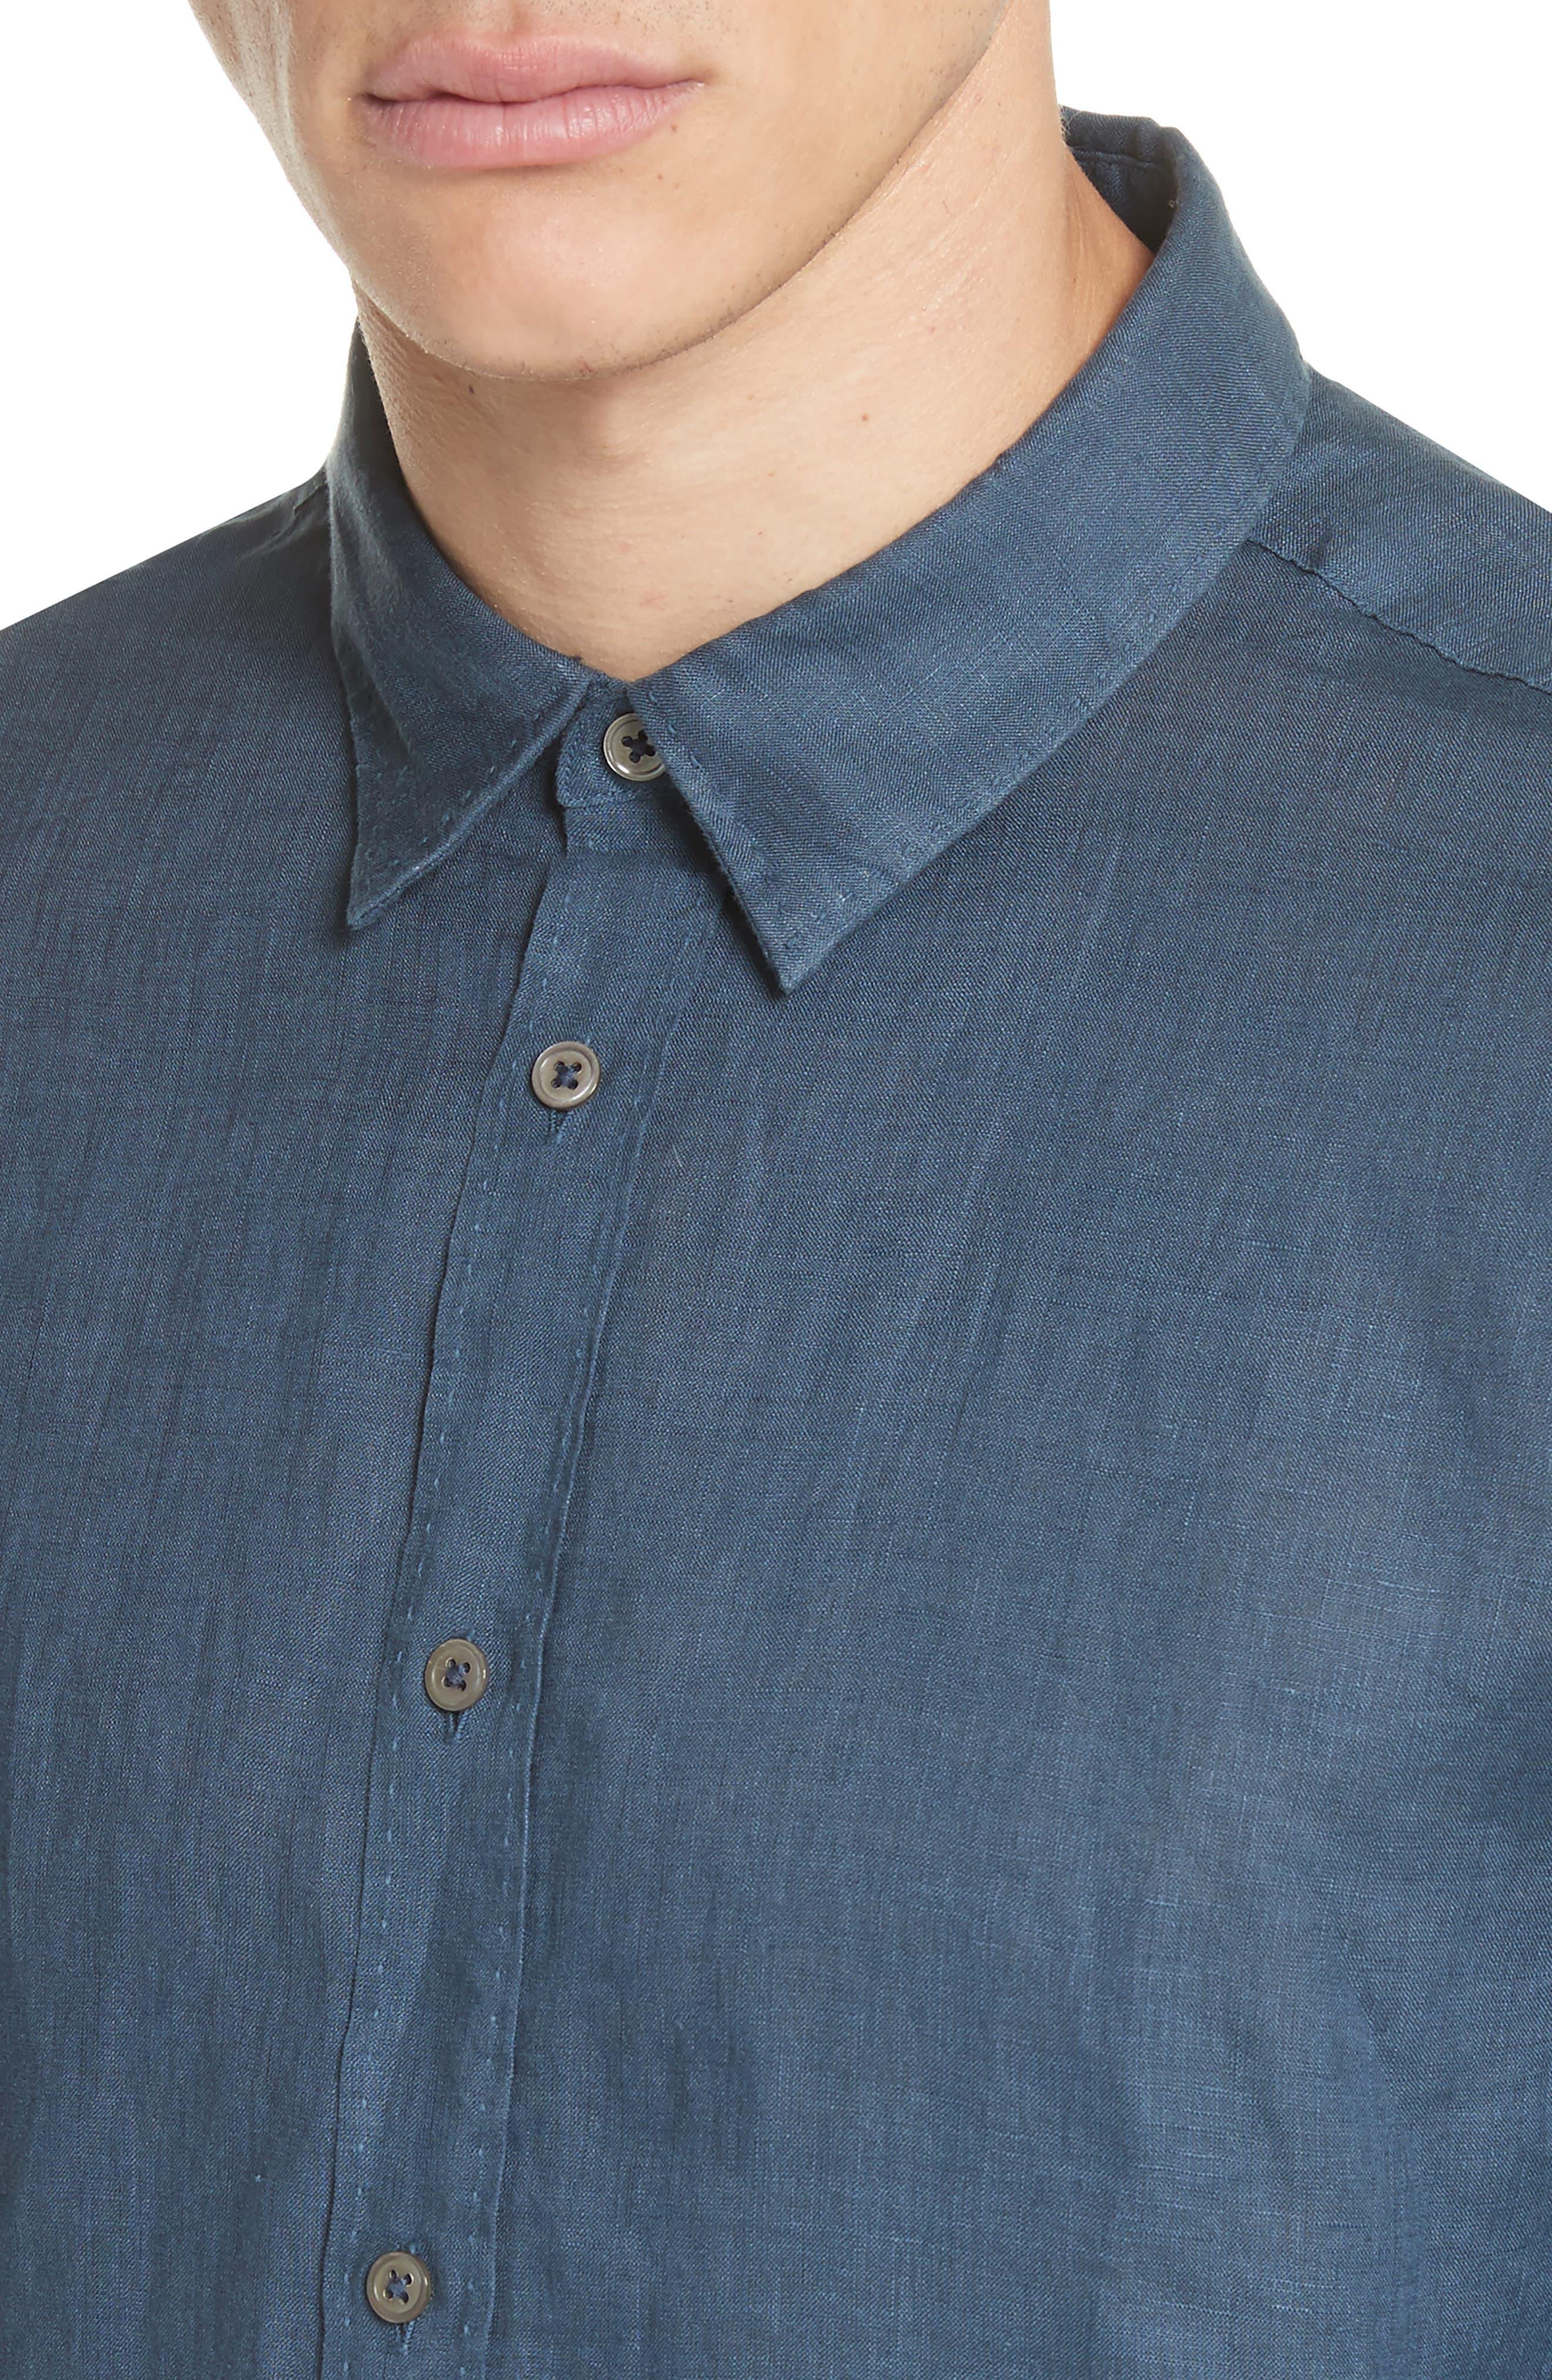 Collection Garment Dyed Linen Shirt,                             Alternate thumbnail 4, color,                             Lake Blue